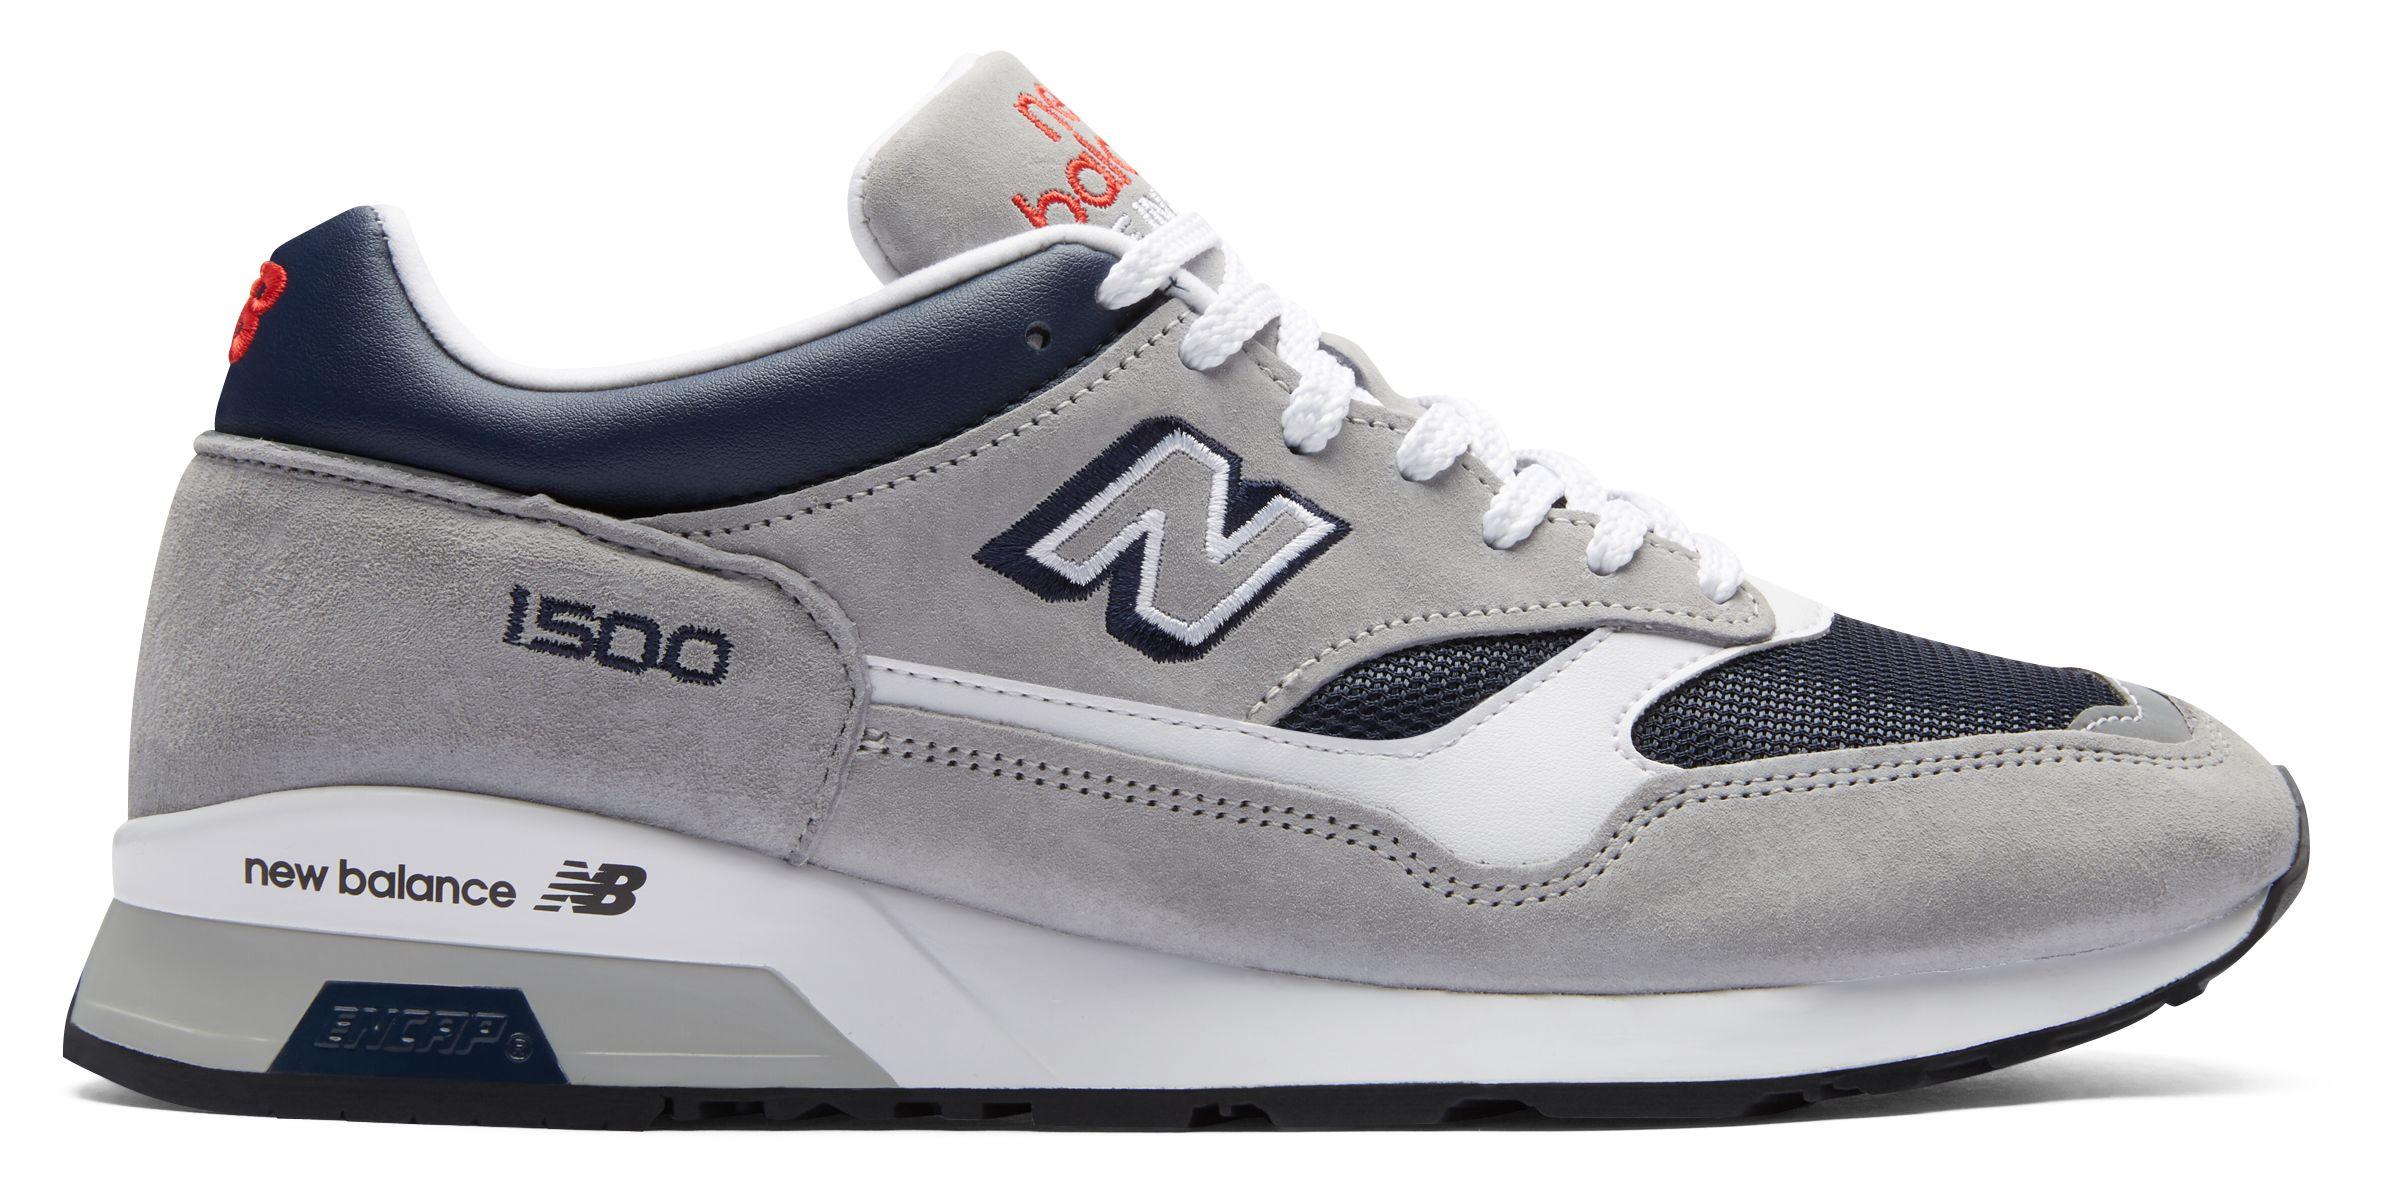 AJF,scarpe new balance 1500,nalan.com.sg